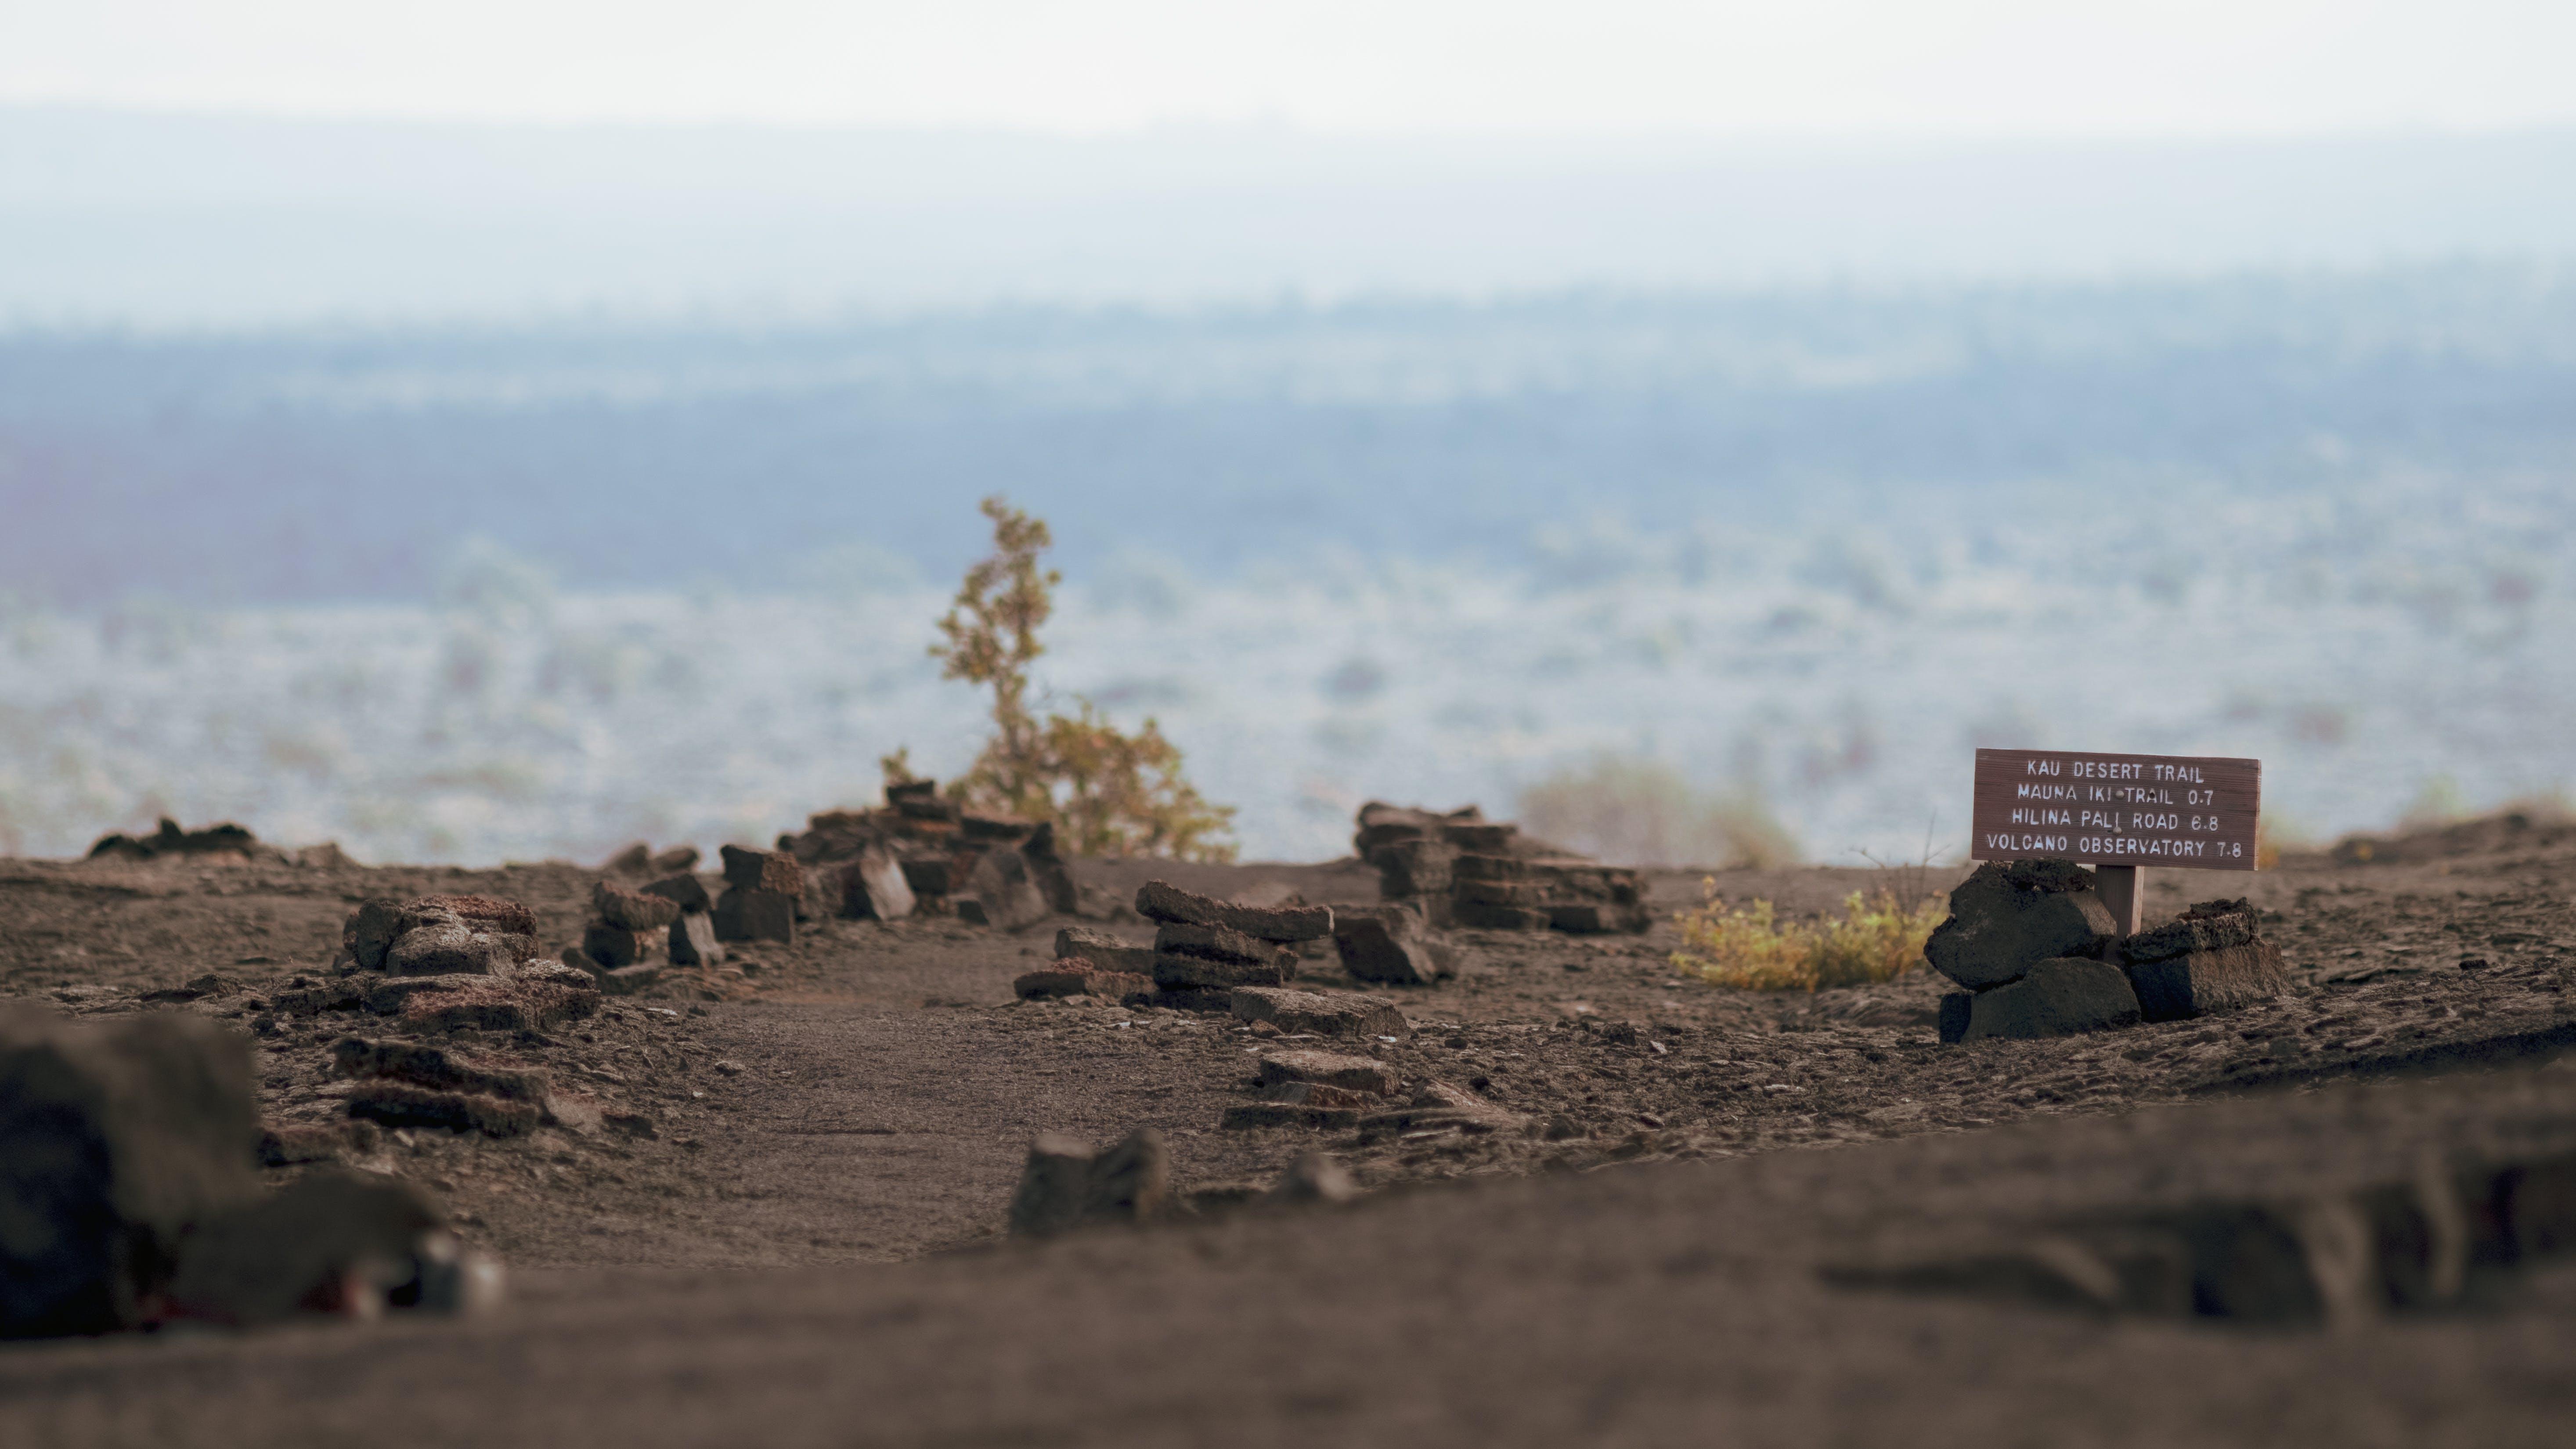 Free stock photo of desert, desolate, HAVO, hawaii